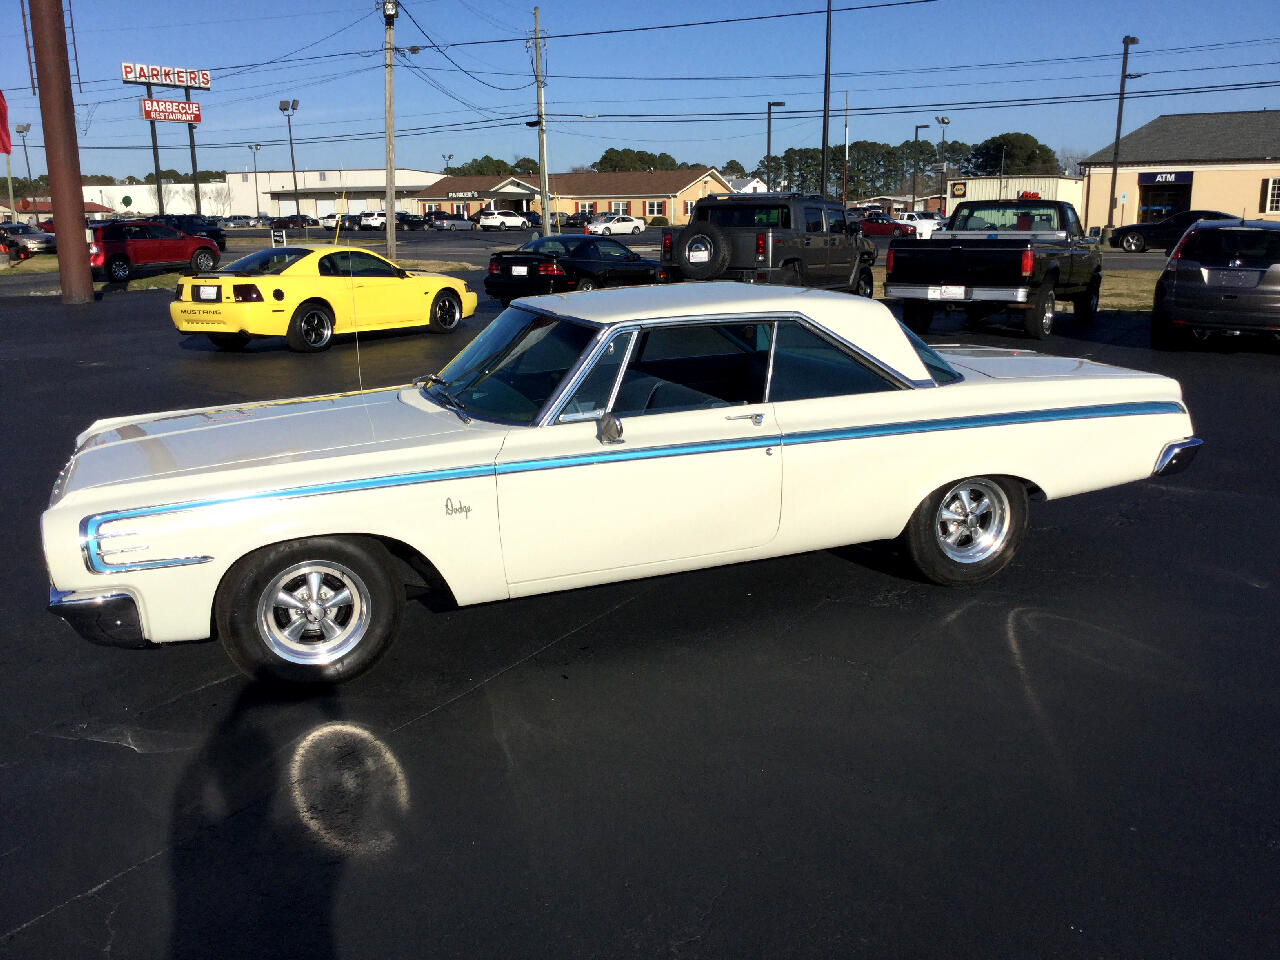 1964 Dodge Polara 440